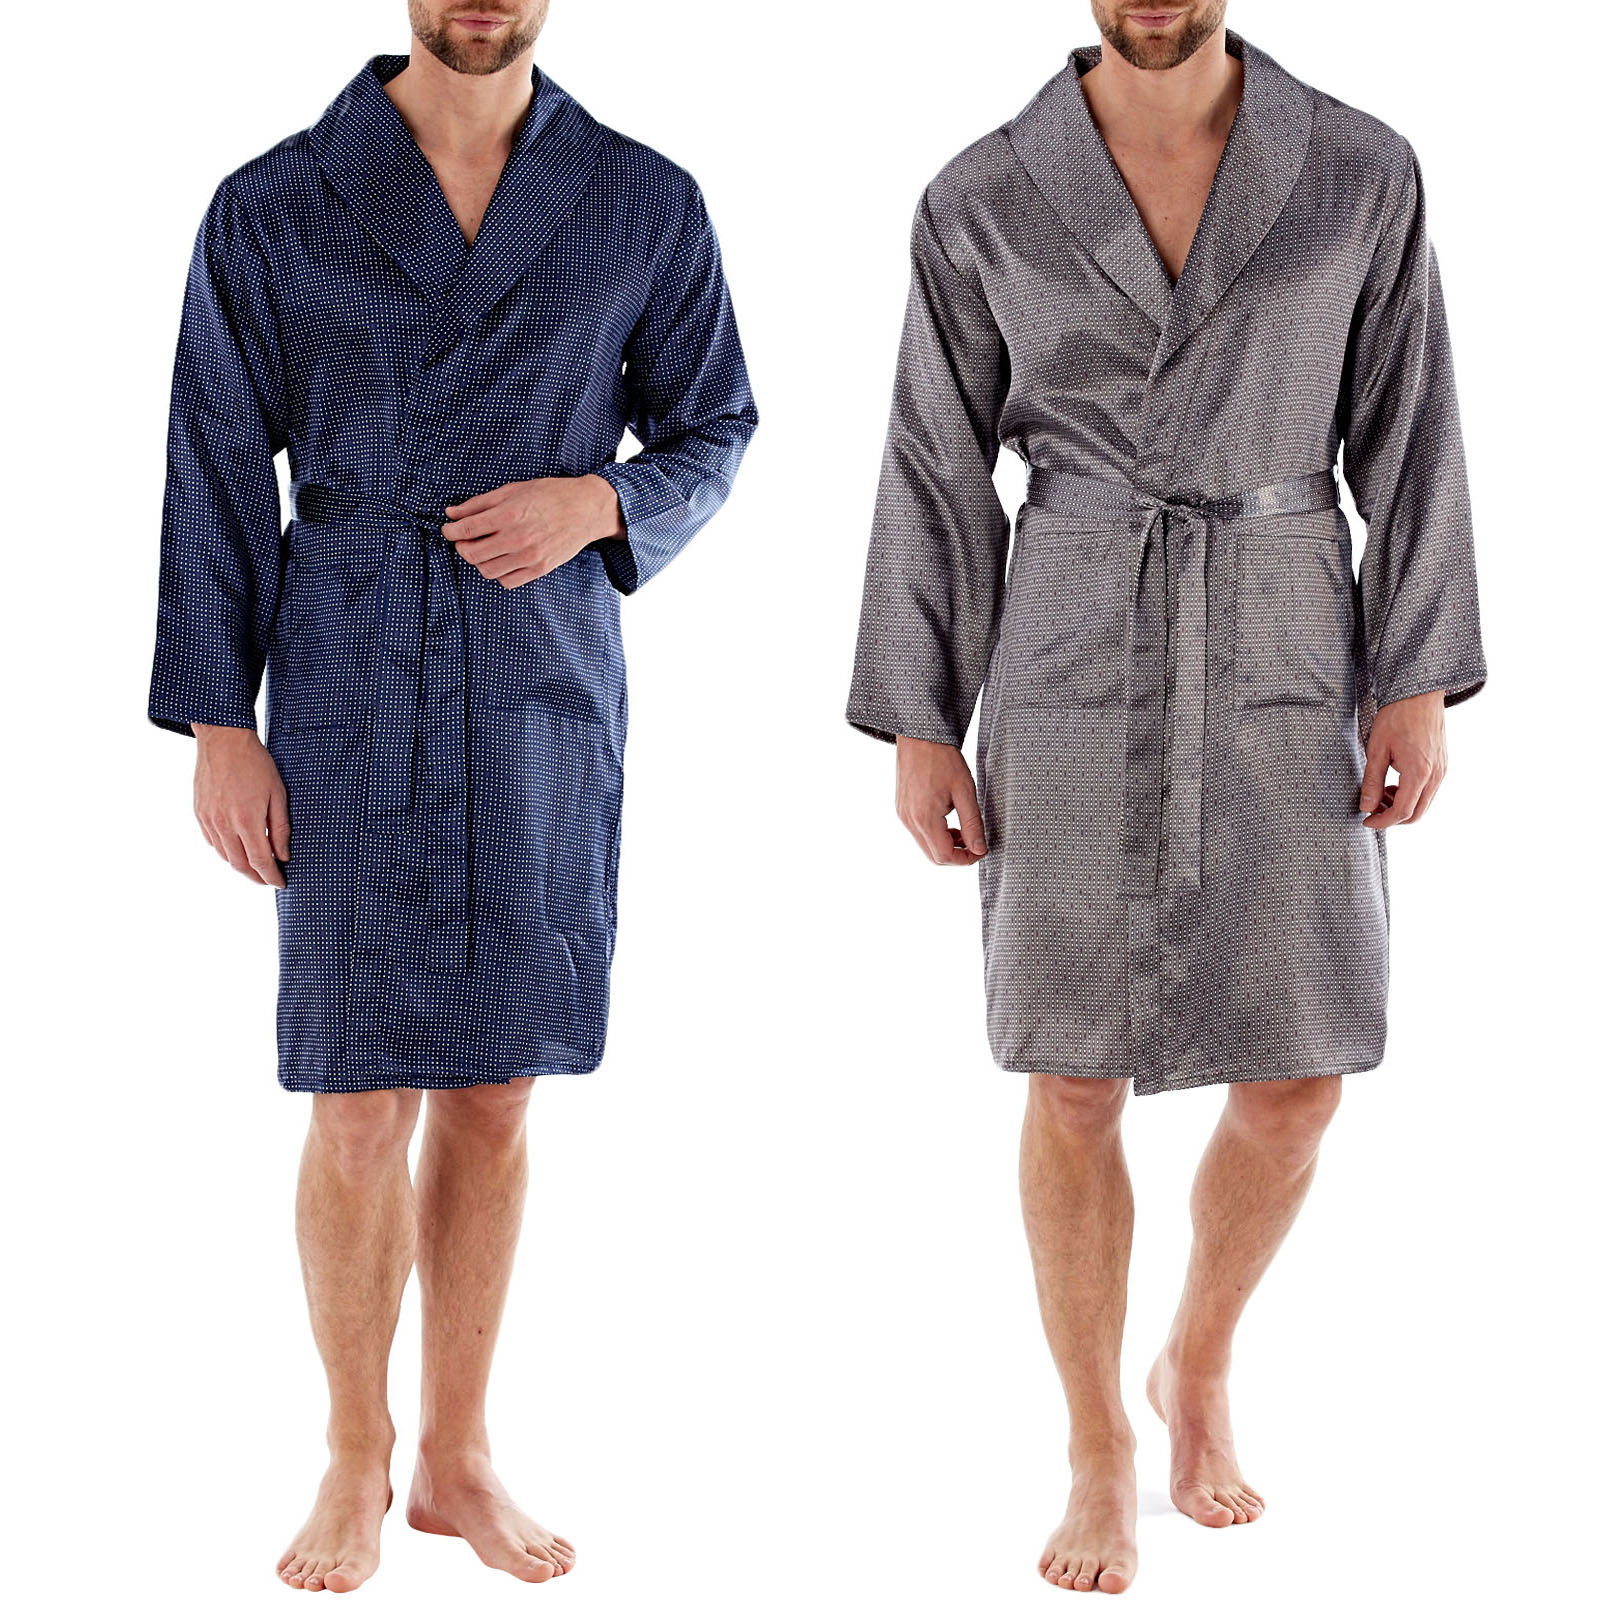 4 COLOURS MENS HARVEY JAMES SATIN DRESSING GOWN//ROBE UK SIZES M-XXL